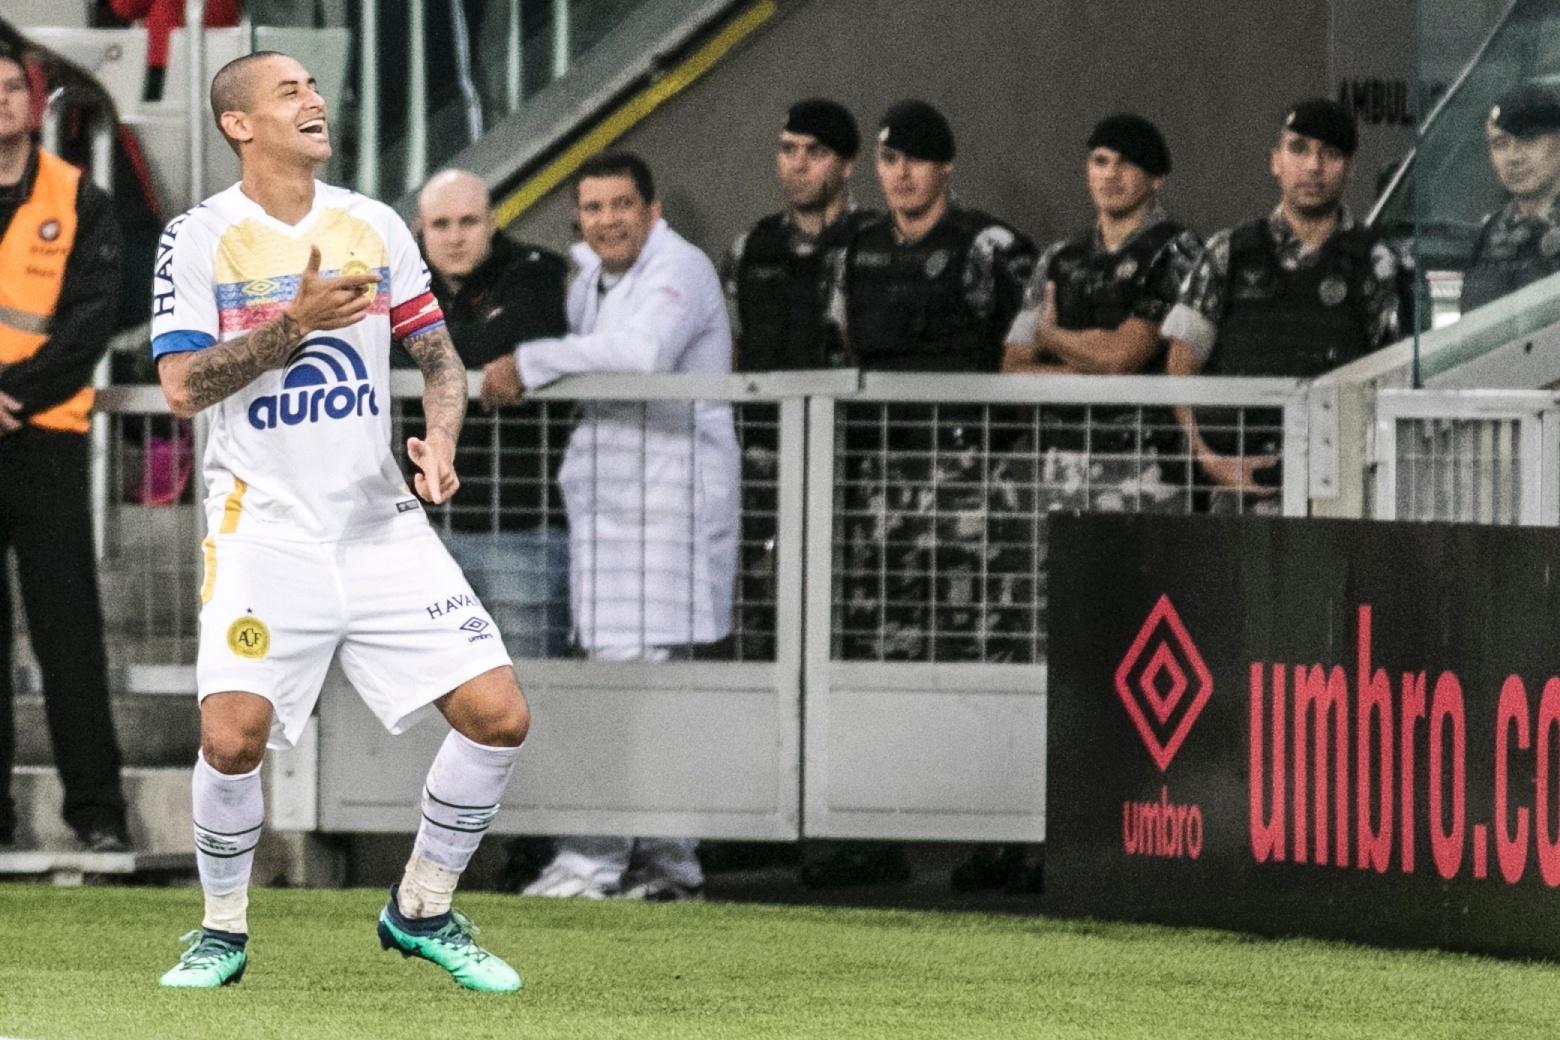 Welington Paulista comemora gol da Chapecoense contra o Atlético-PR